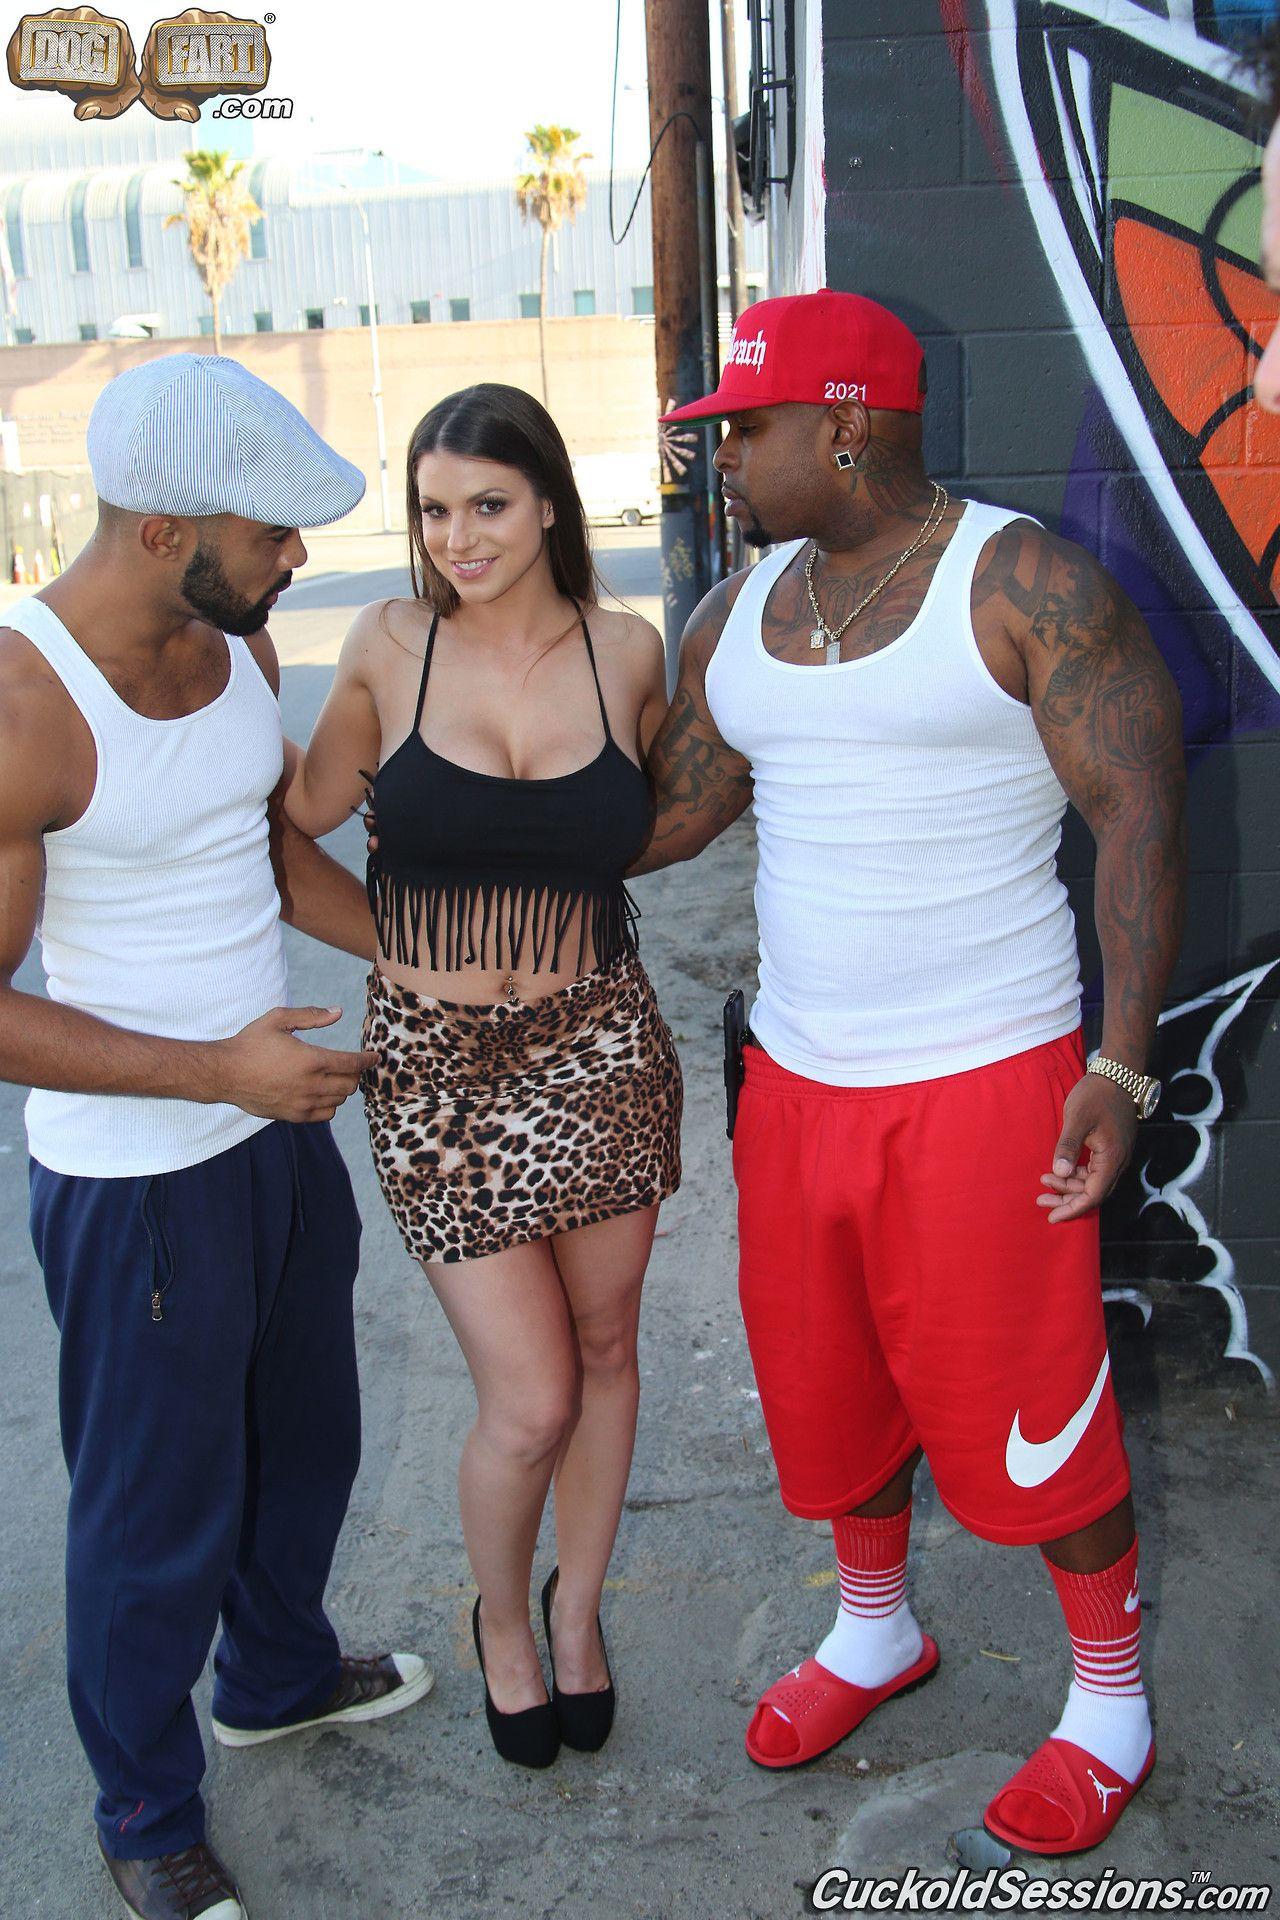 Interracial dating brooklyn